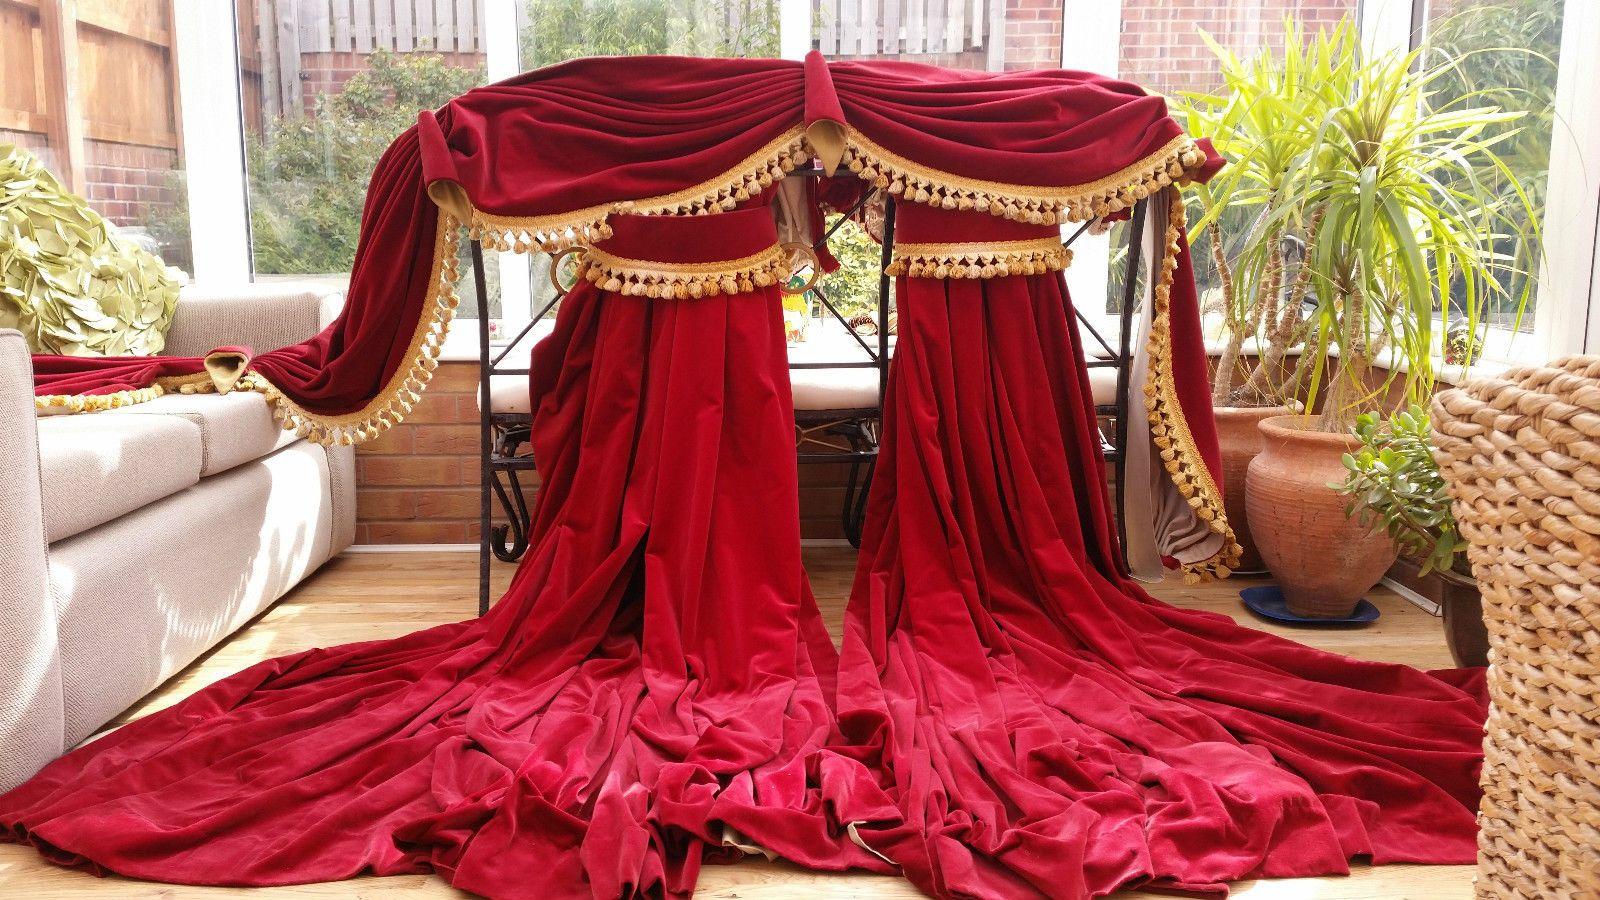 "HUGE PAIR RED VELVET LINED CURTAINS & PELMET 84"" DROP BY 136"" WIDTH PAIR 1 in Home, Furniture & DIY, Curtains & Blinds, Curtains & Pelmets | eBay"